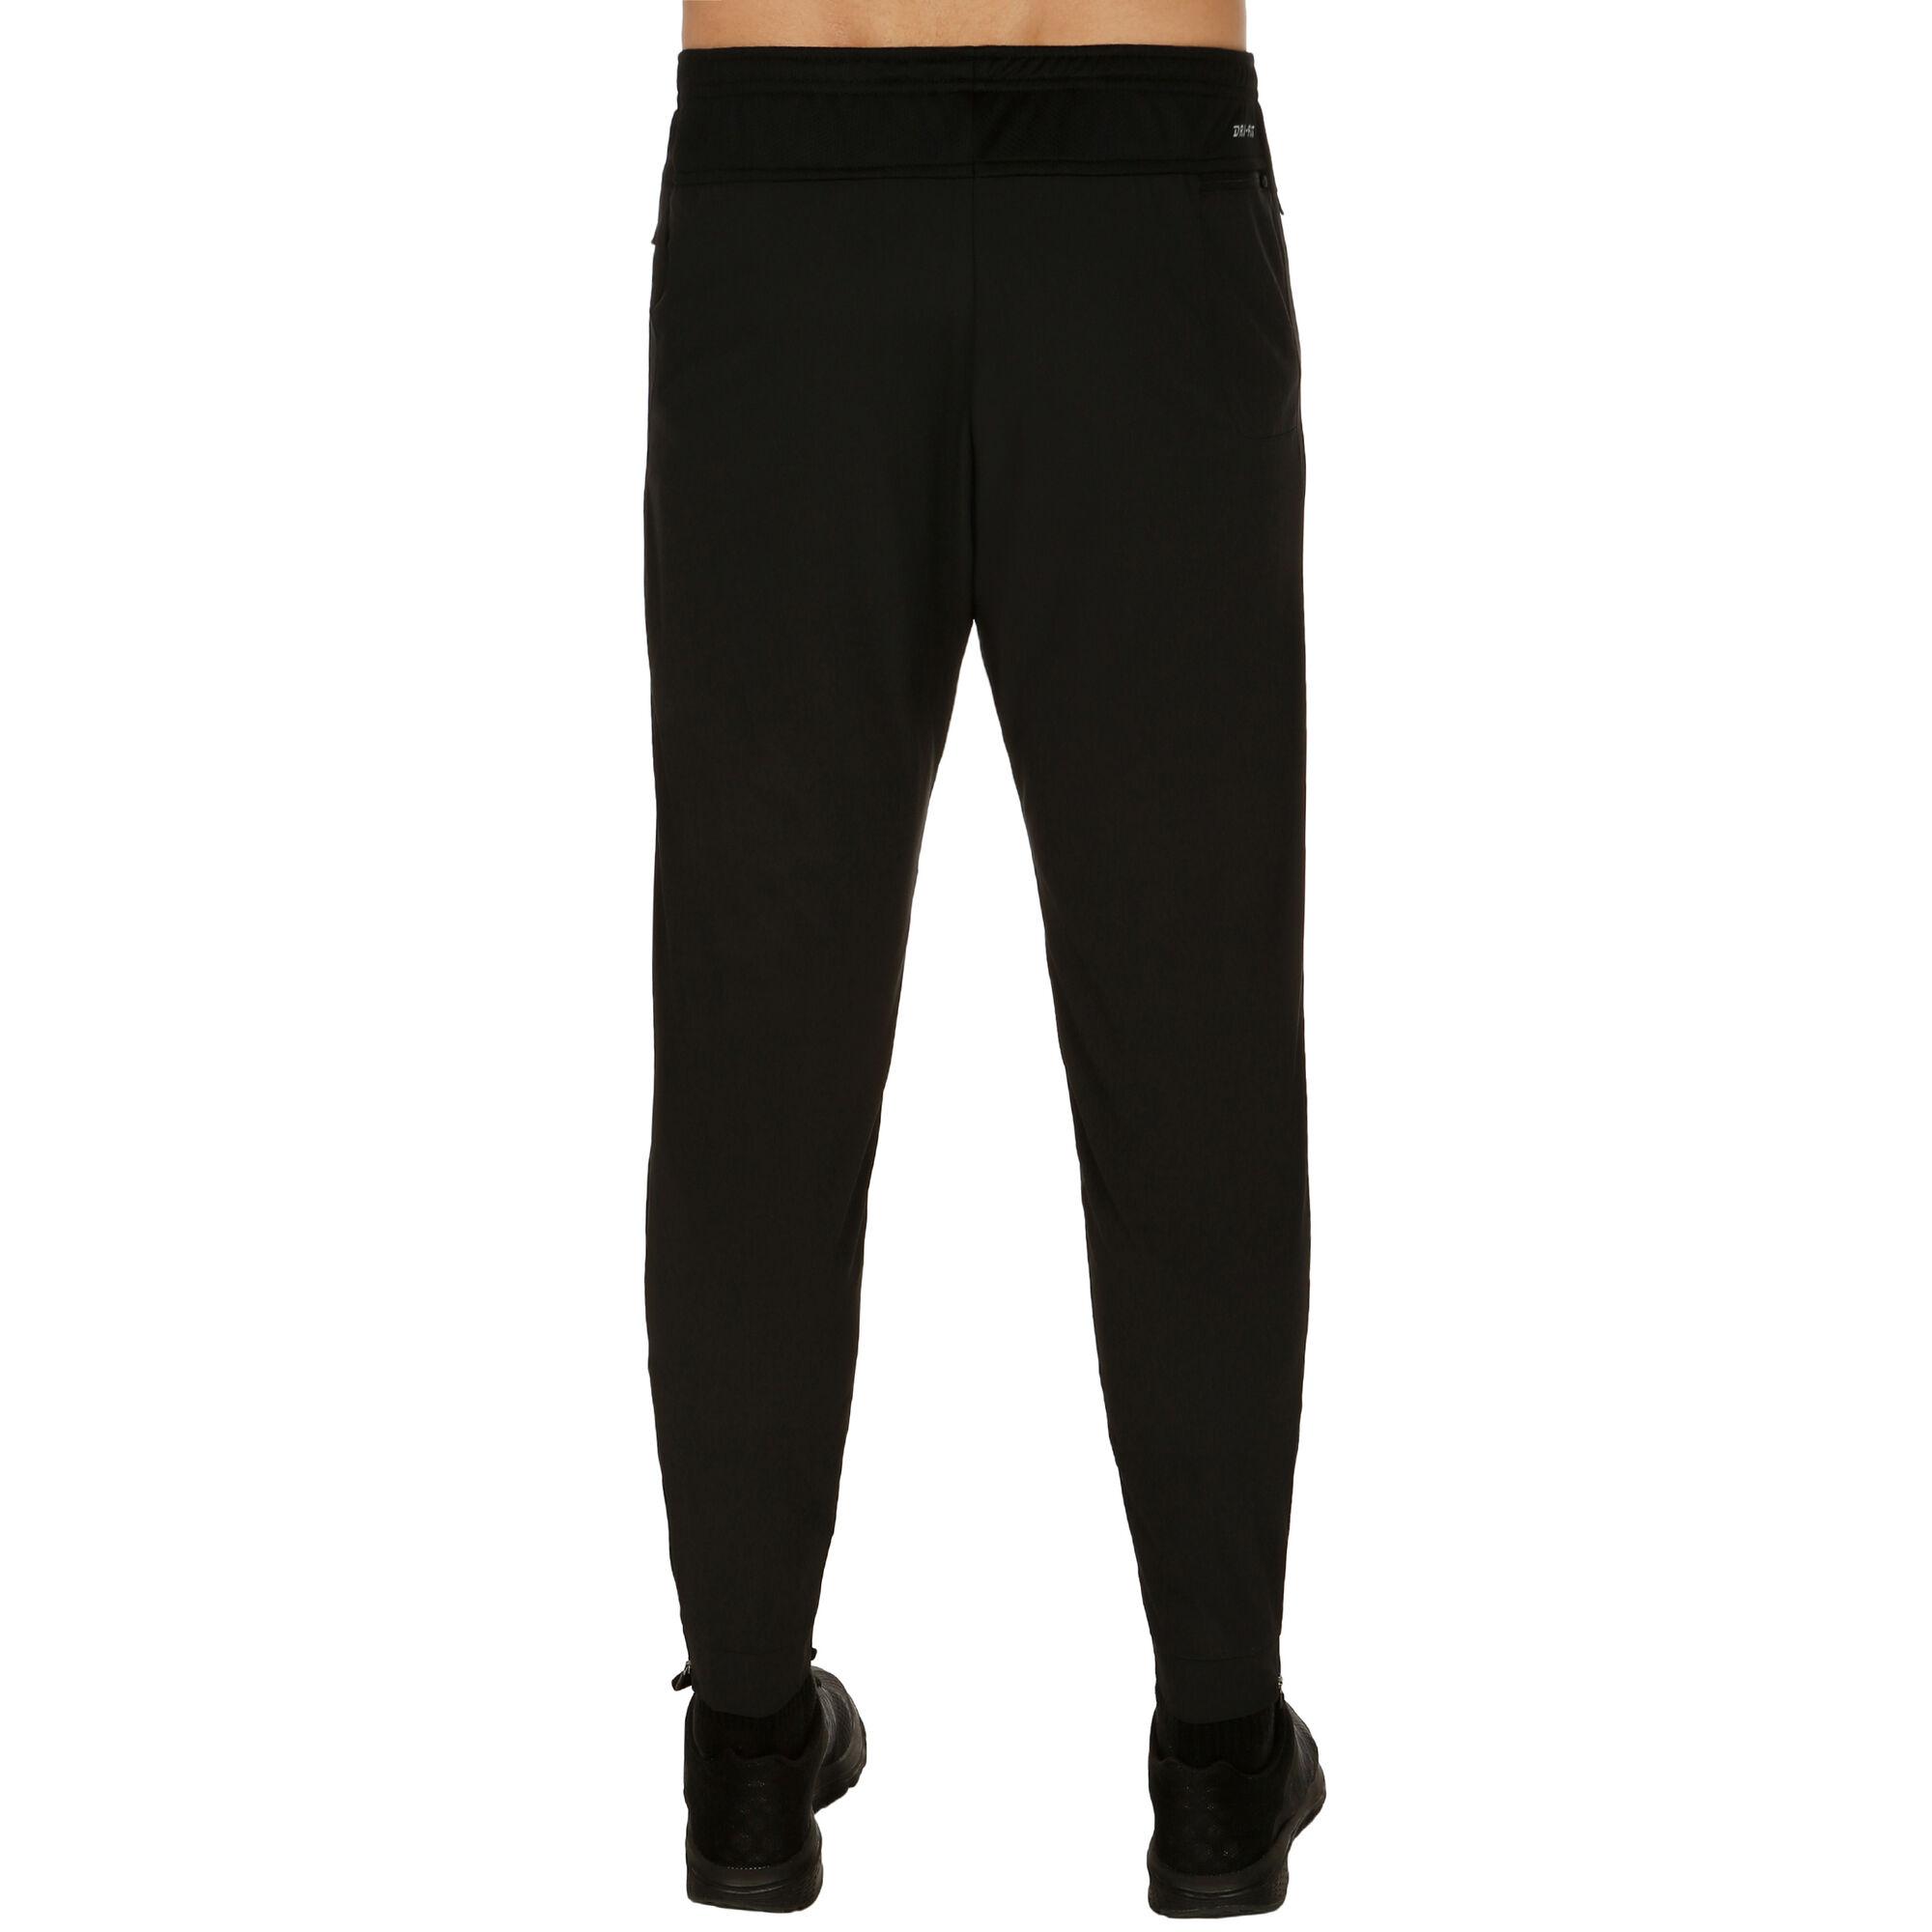 be4862499de1 buy Nike Flex Essential Running Pants Men - Black